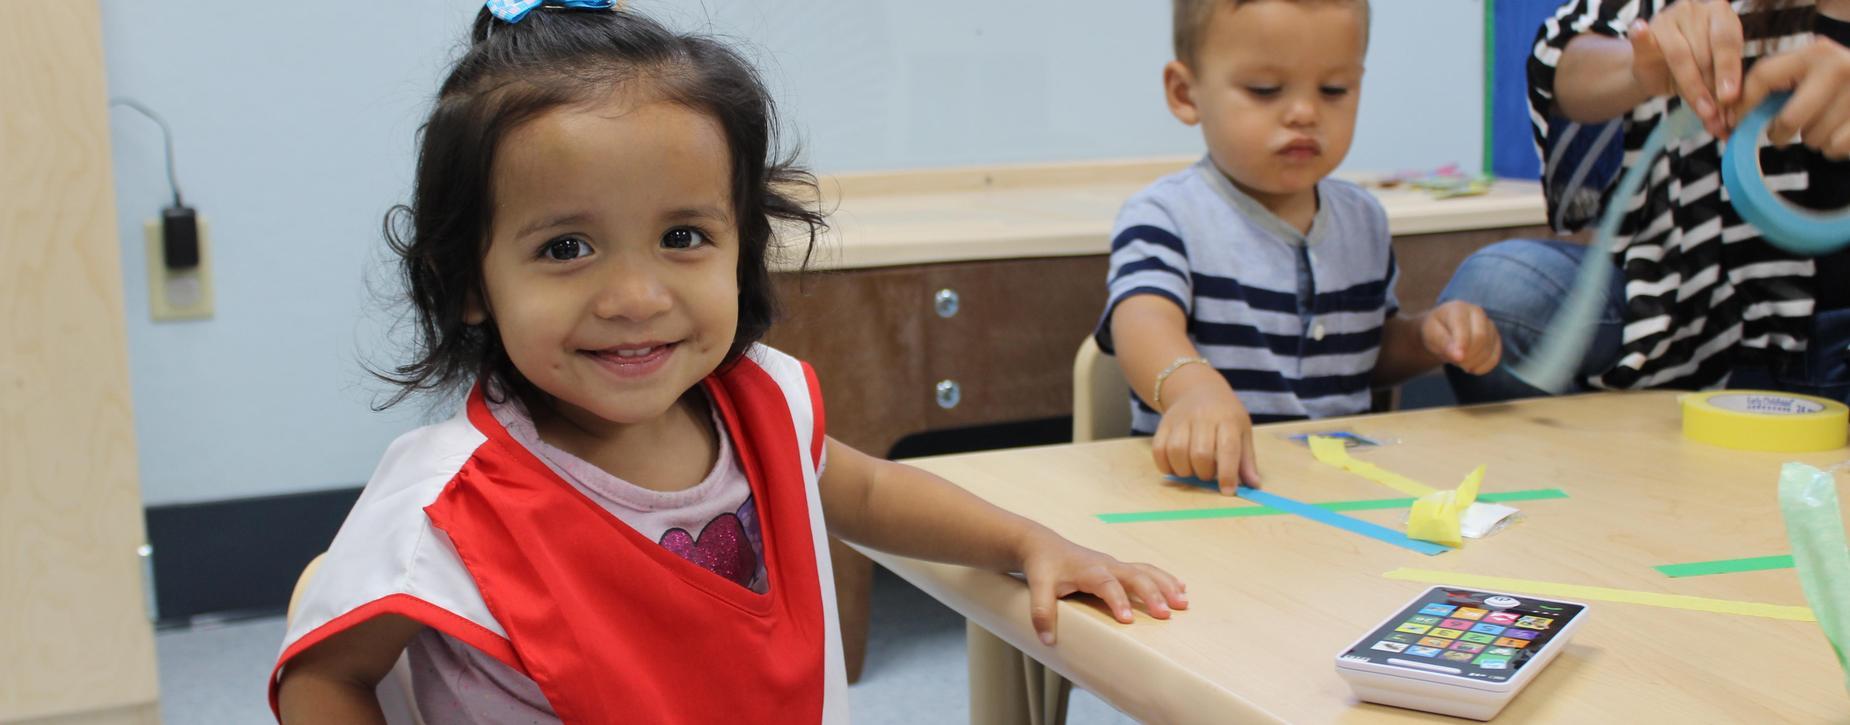 Preschool with toy smartphone